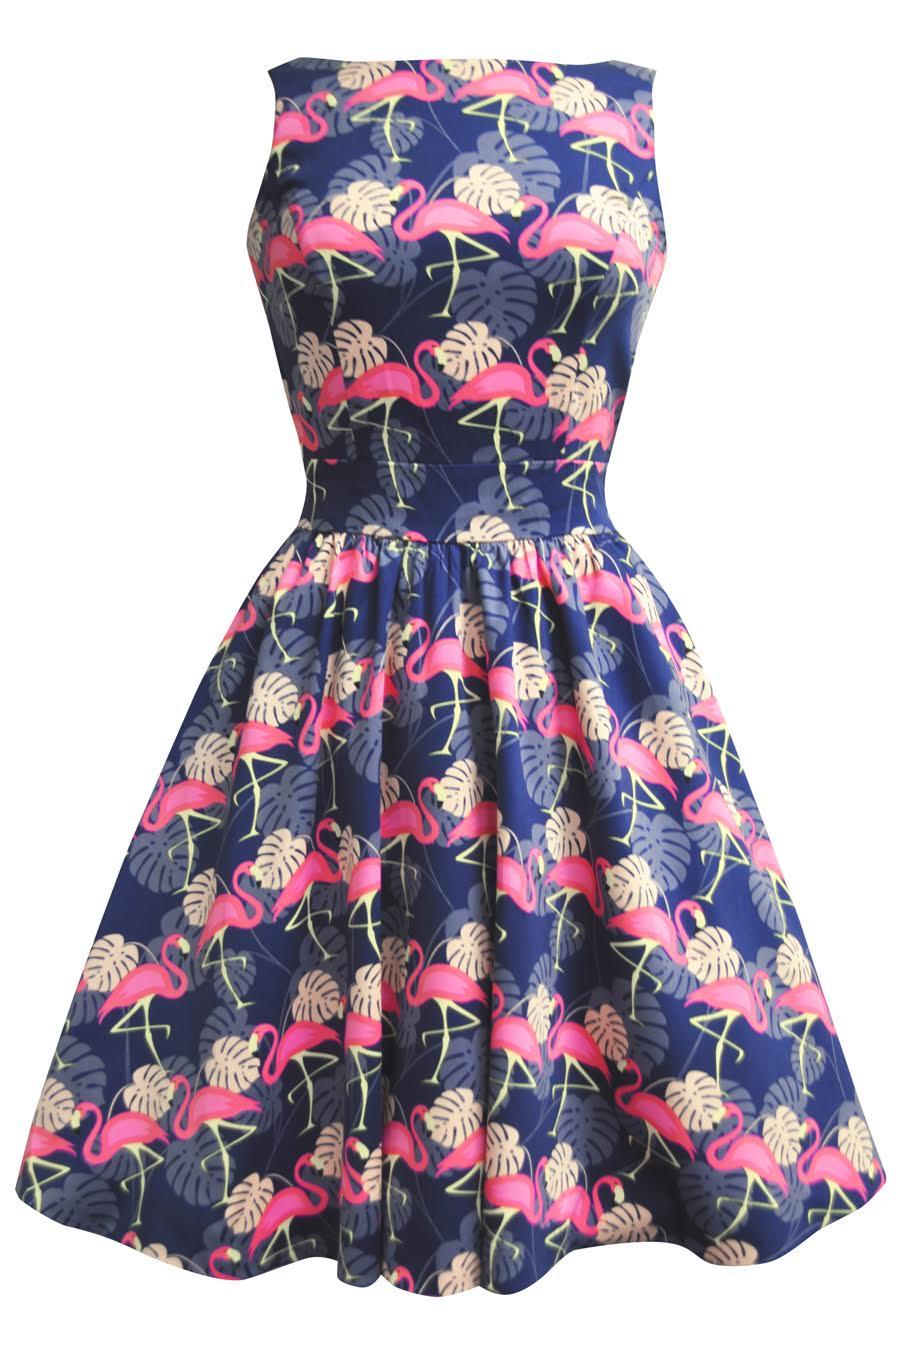 Flamingo Tea Dress Elsie S Attic